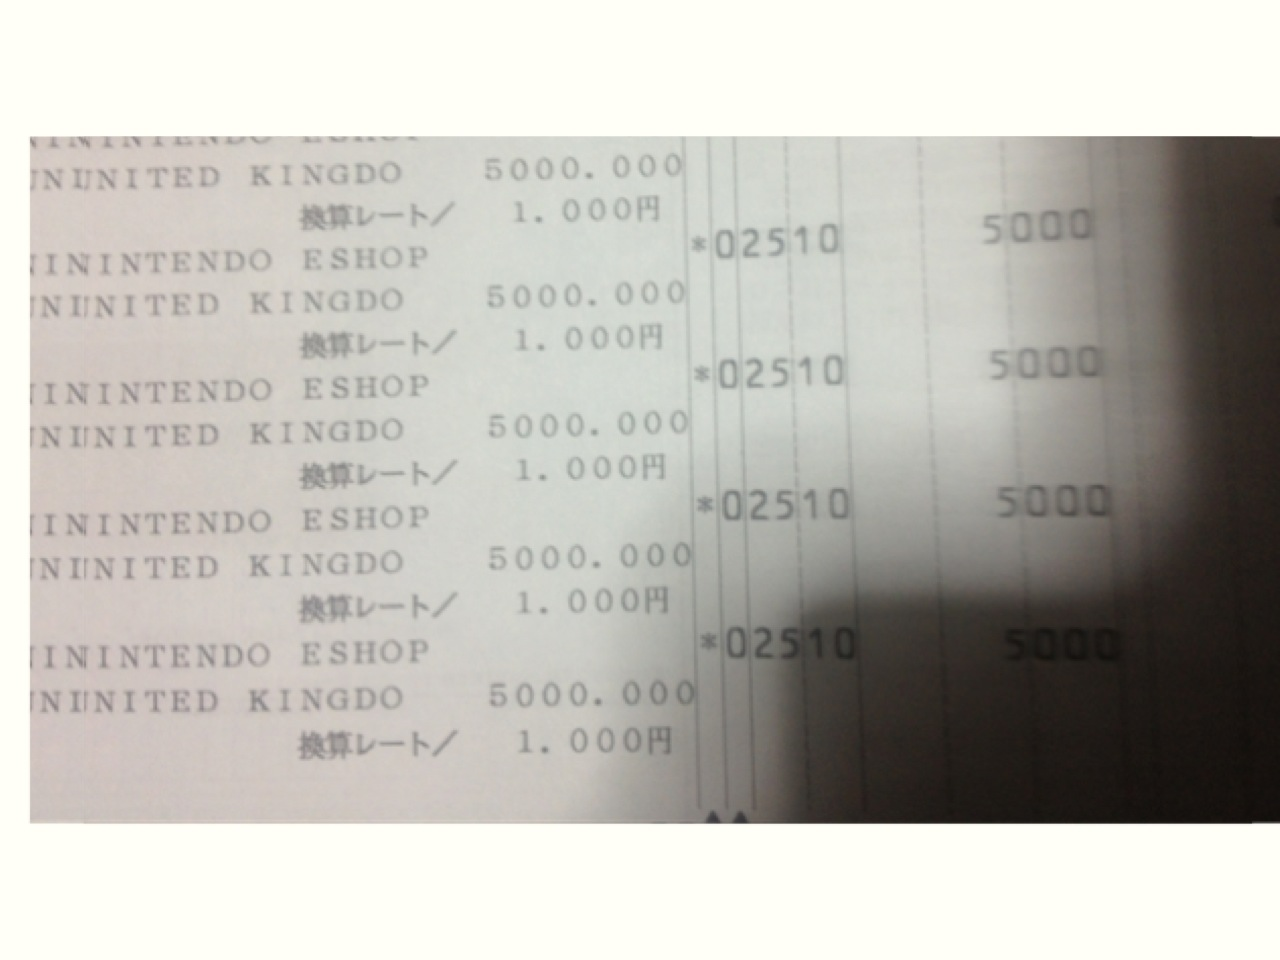 NINTENDO ESHOPからカード利用明細に身に覚えのない多額の請求